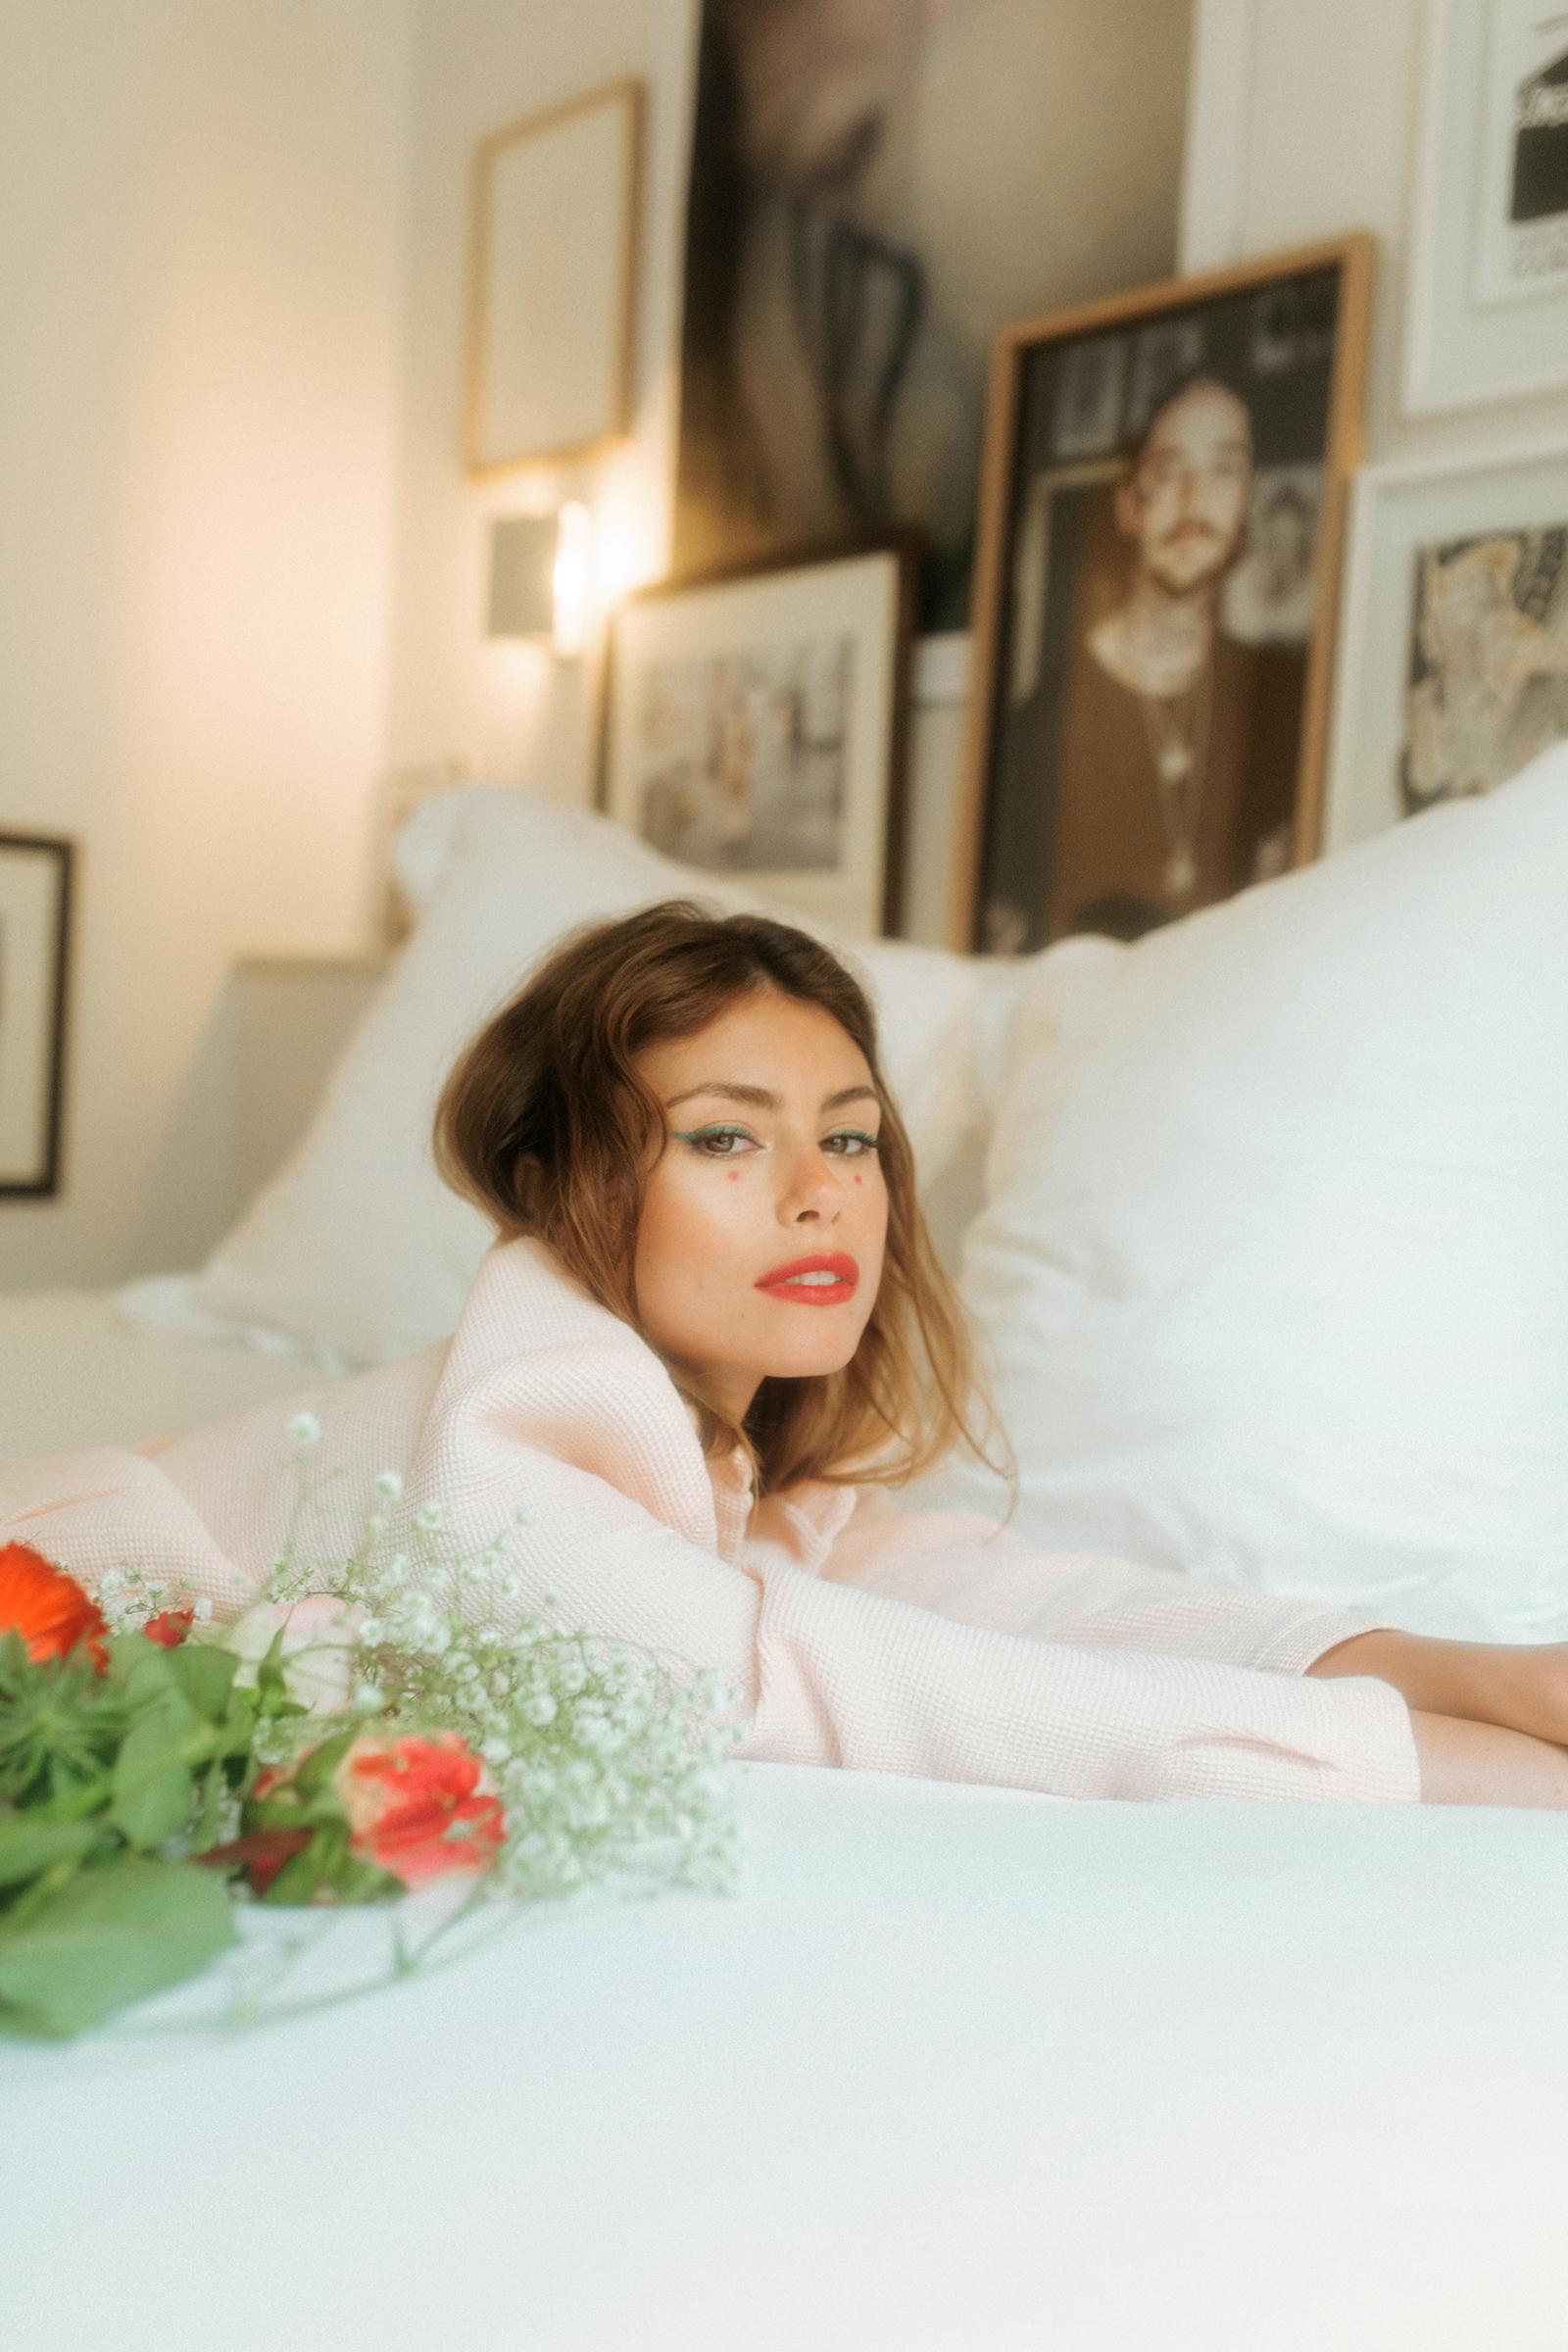 editorial_Yasmine-Ravel_anne-charlotte-moreau_01